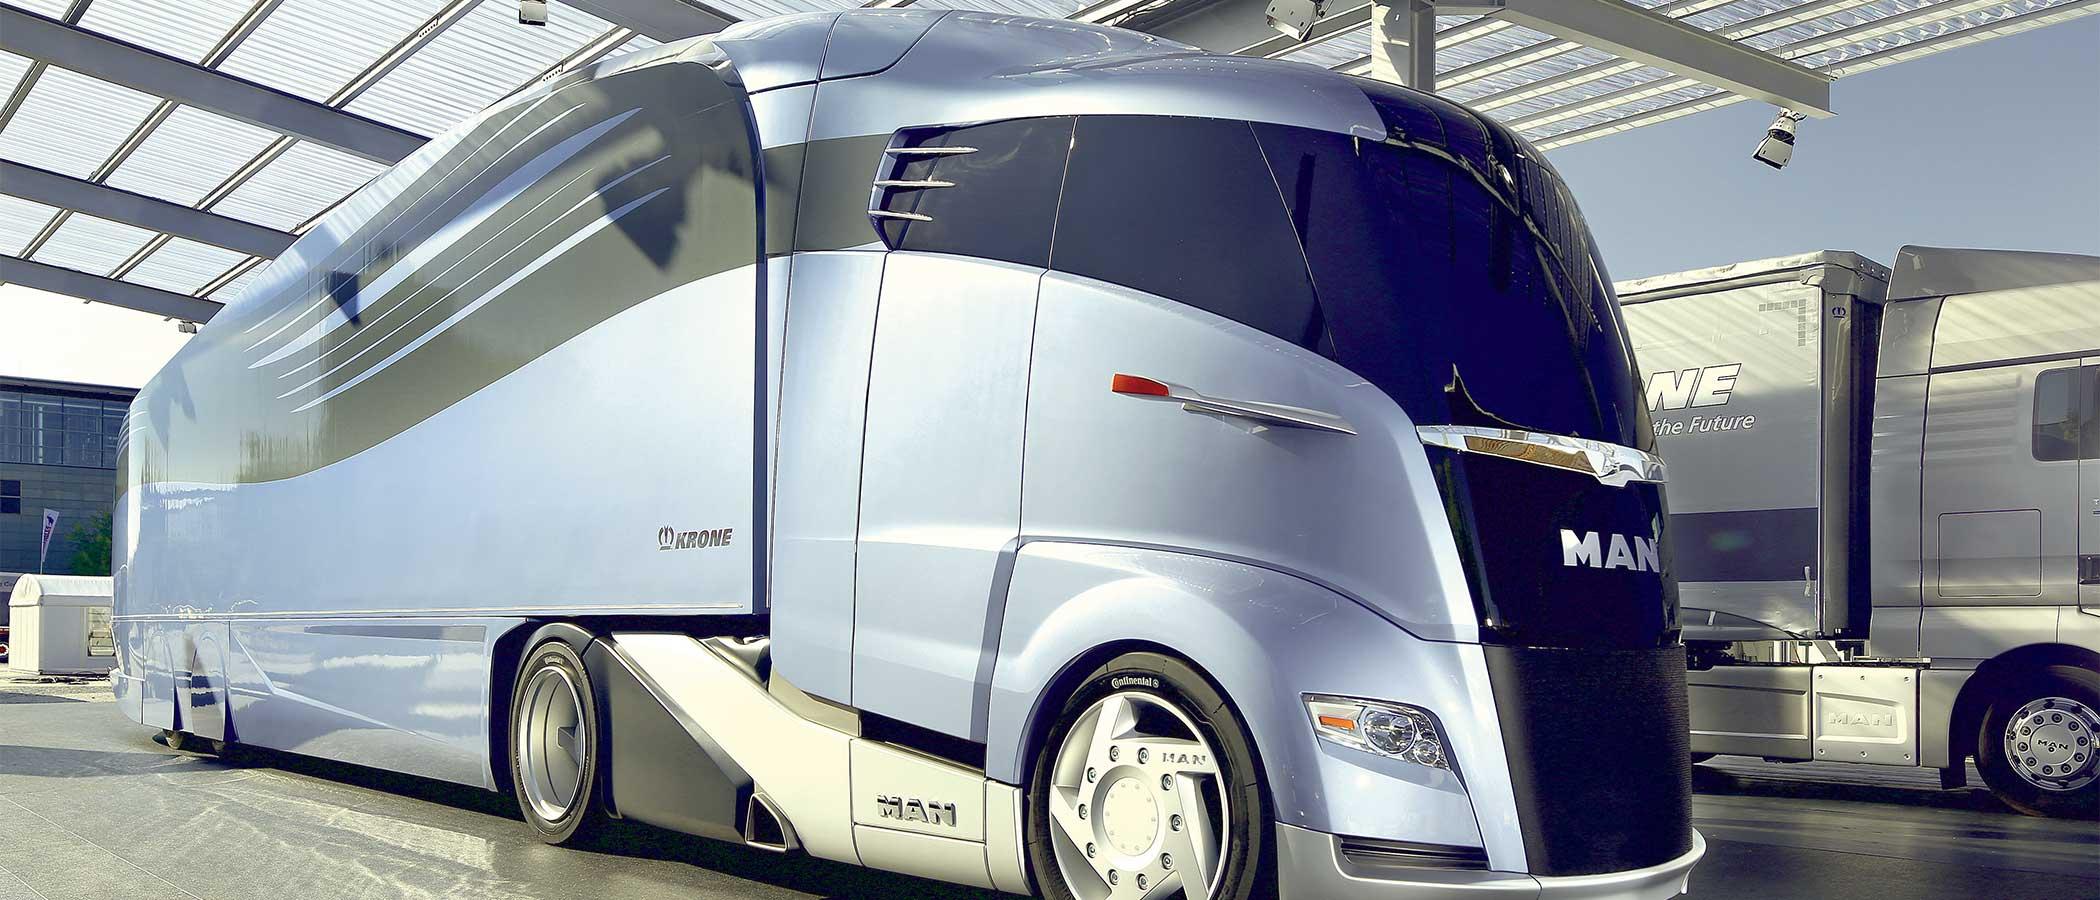 Concept commercial transport truck.